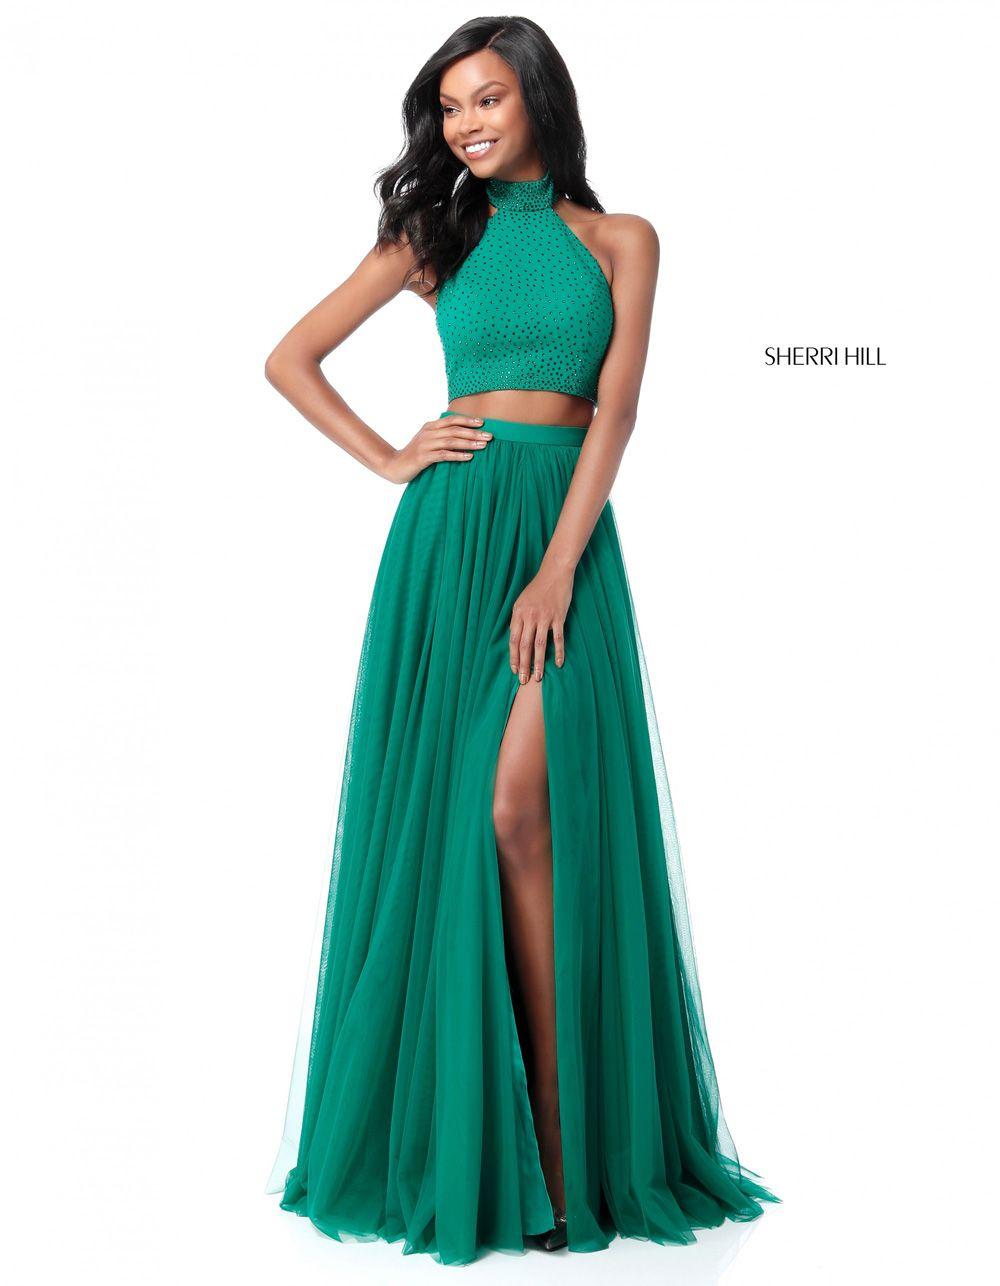 Sherri Hill 51721 International Prom Association Unique Prom Dresses Prom Dresses For Sale Prom Dresses